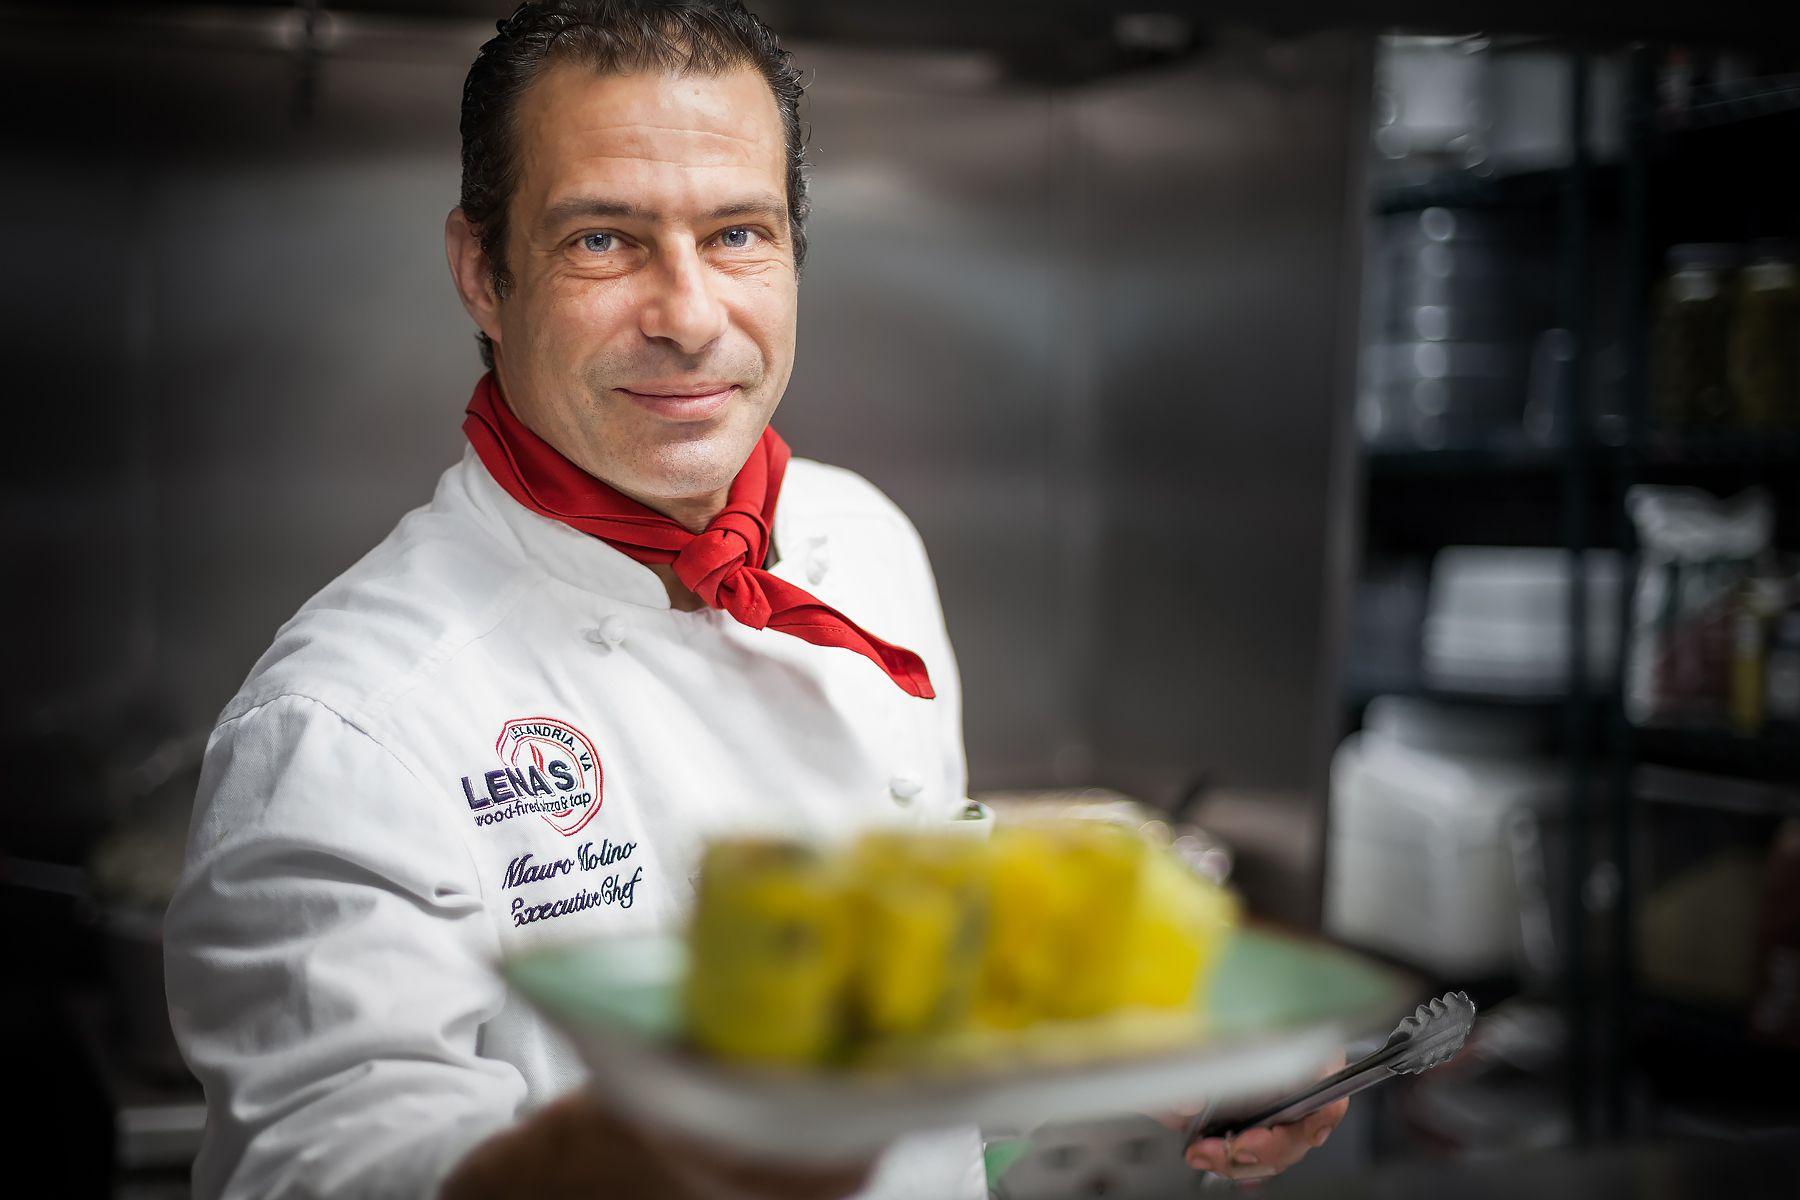 Chef_Mauro_Molino.jpg